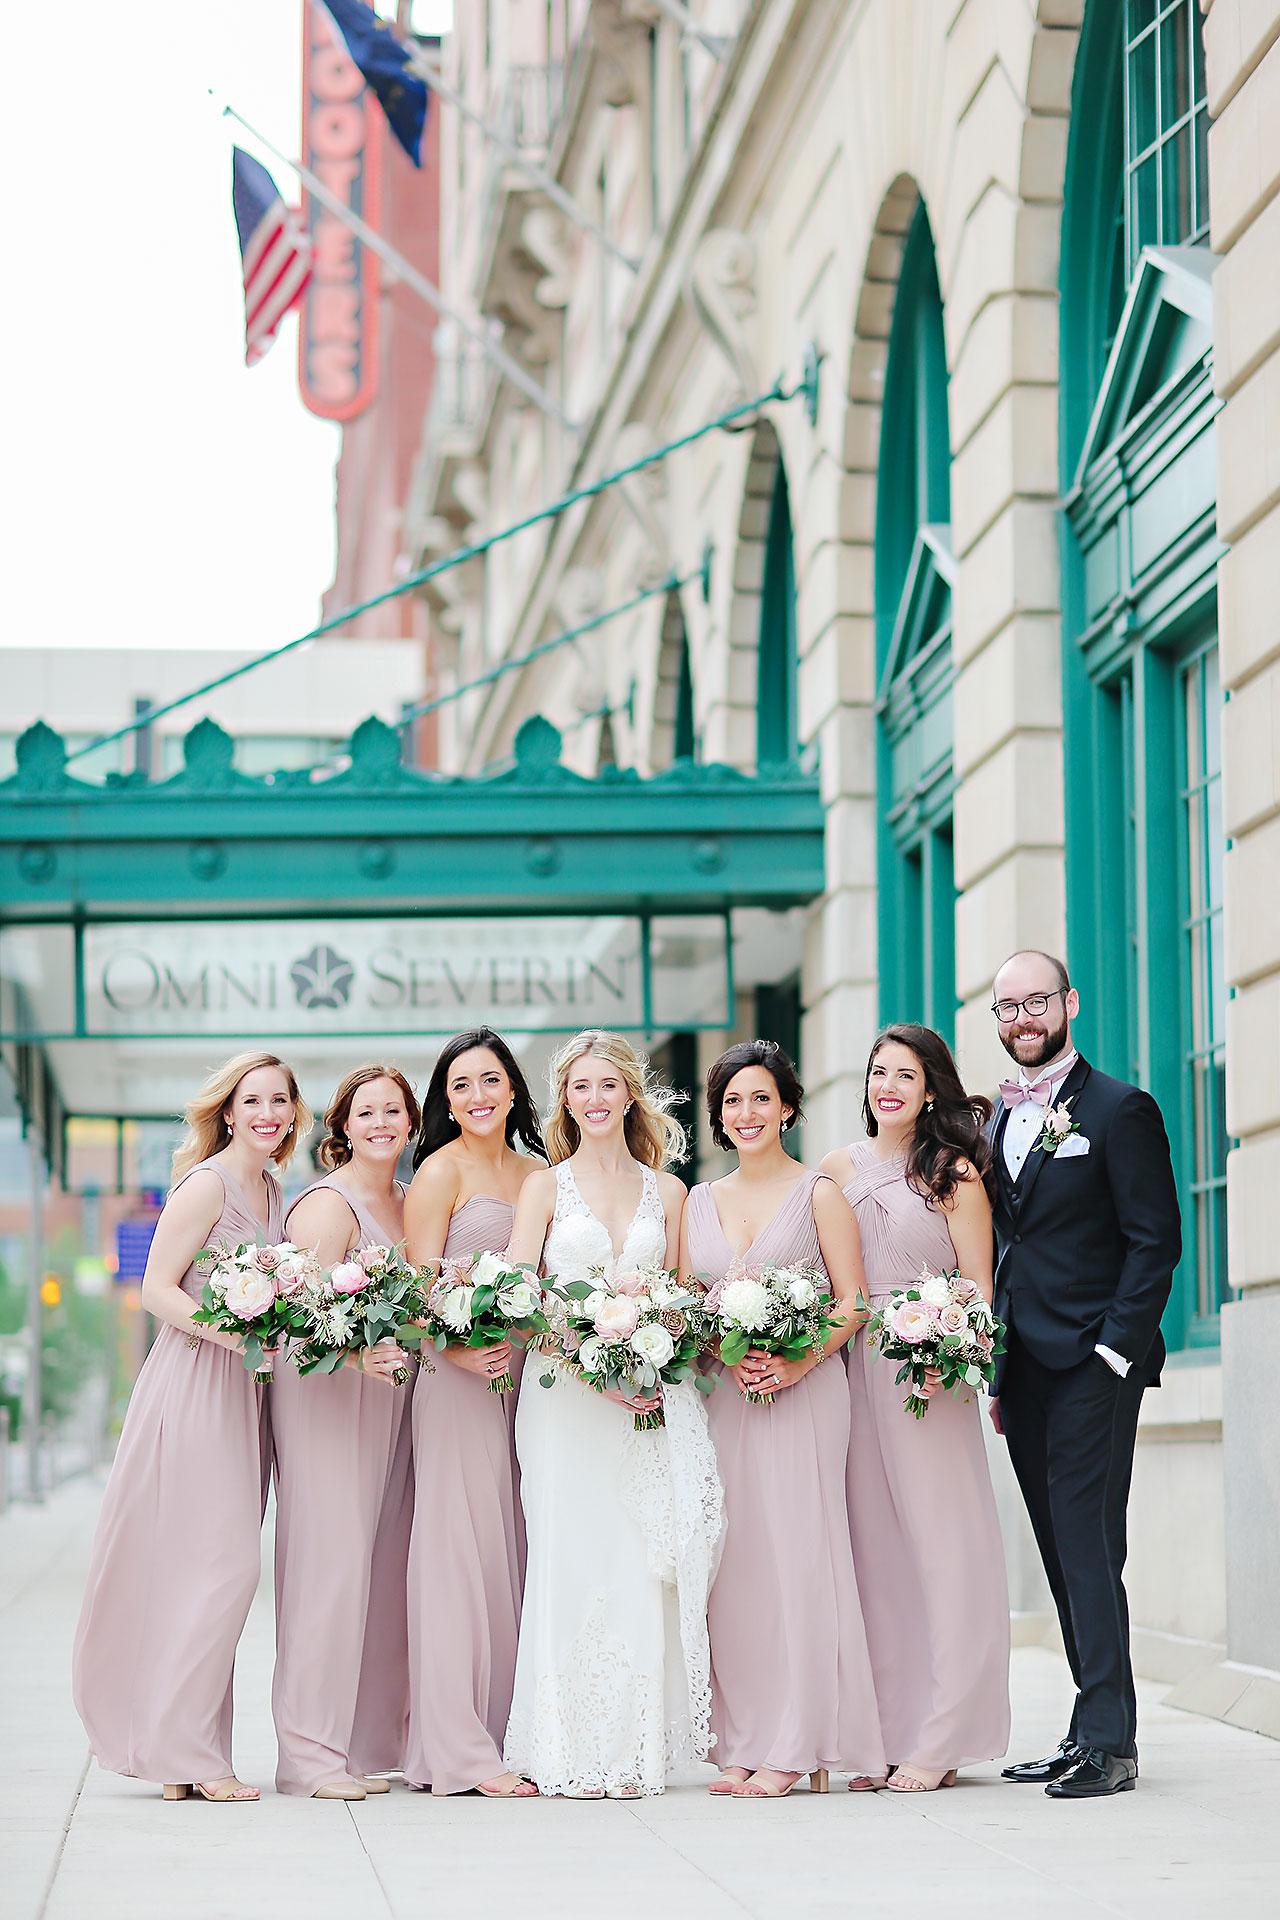 Allison Jeff Union Station Crowne Plaza Indianapolis wedding 074